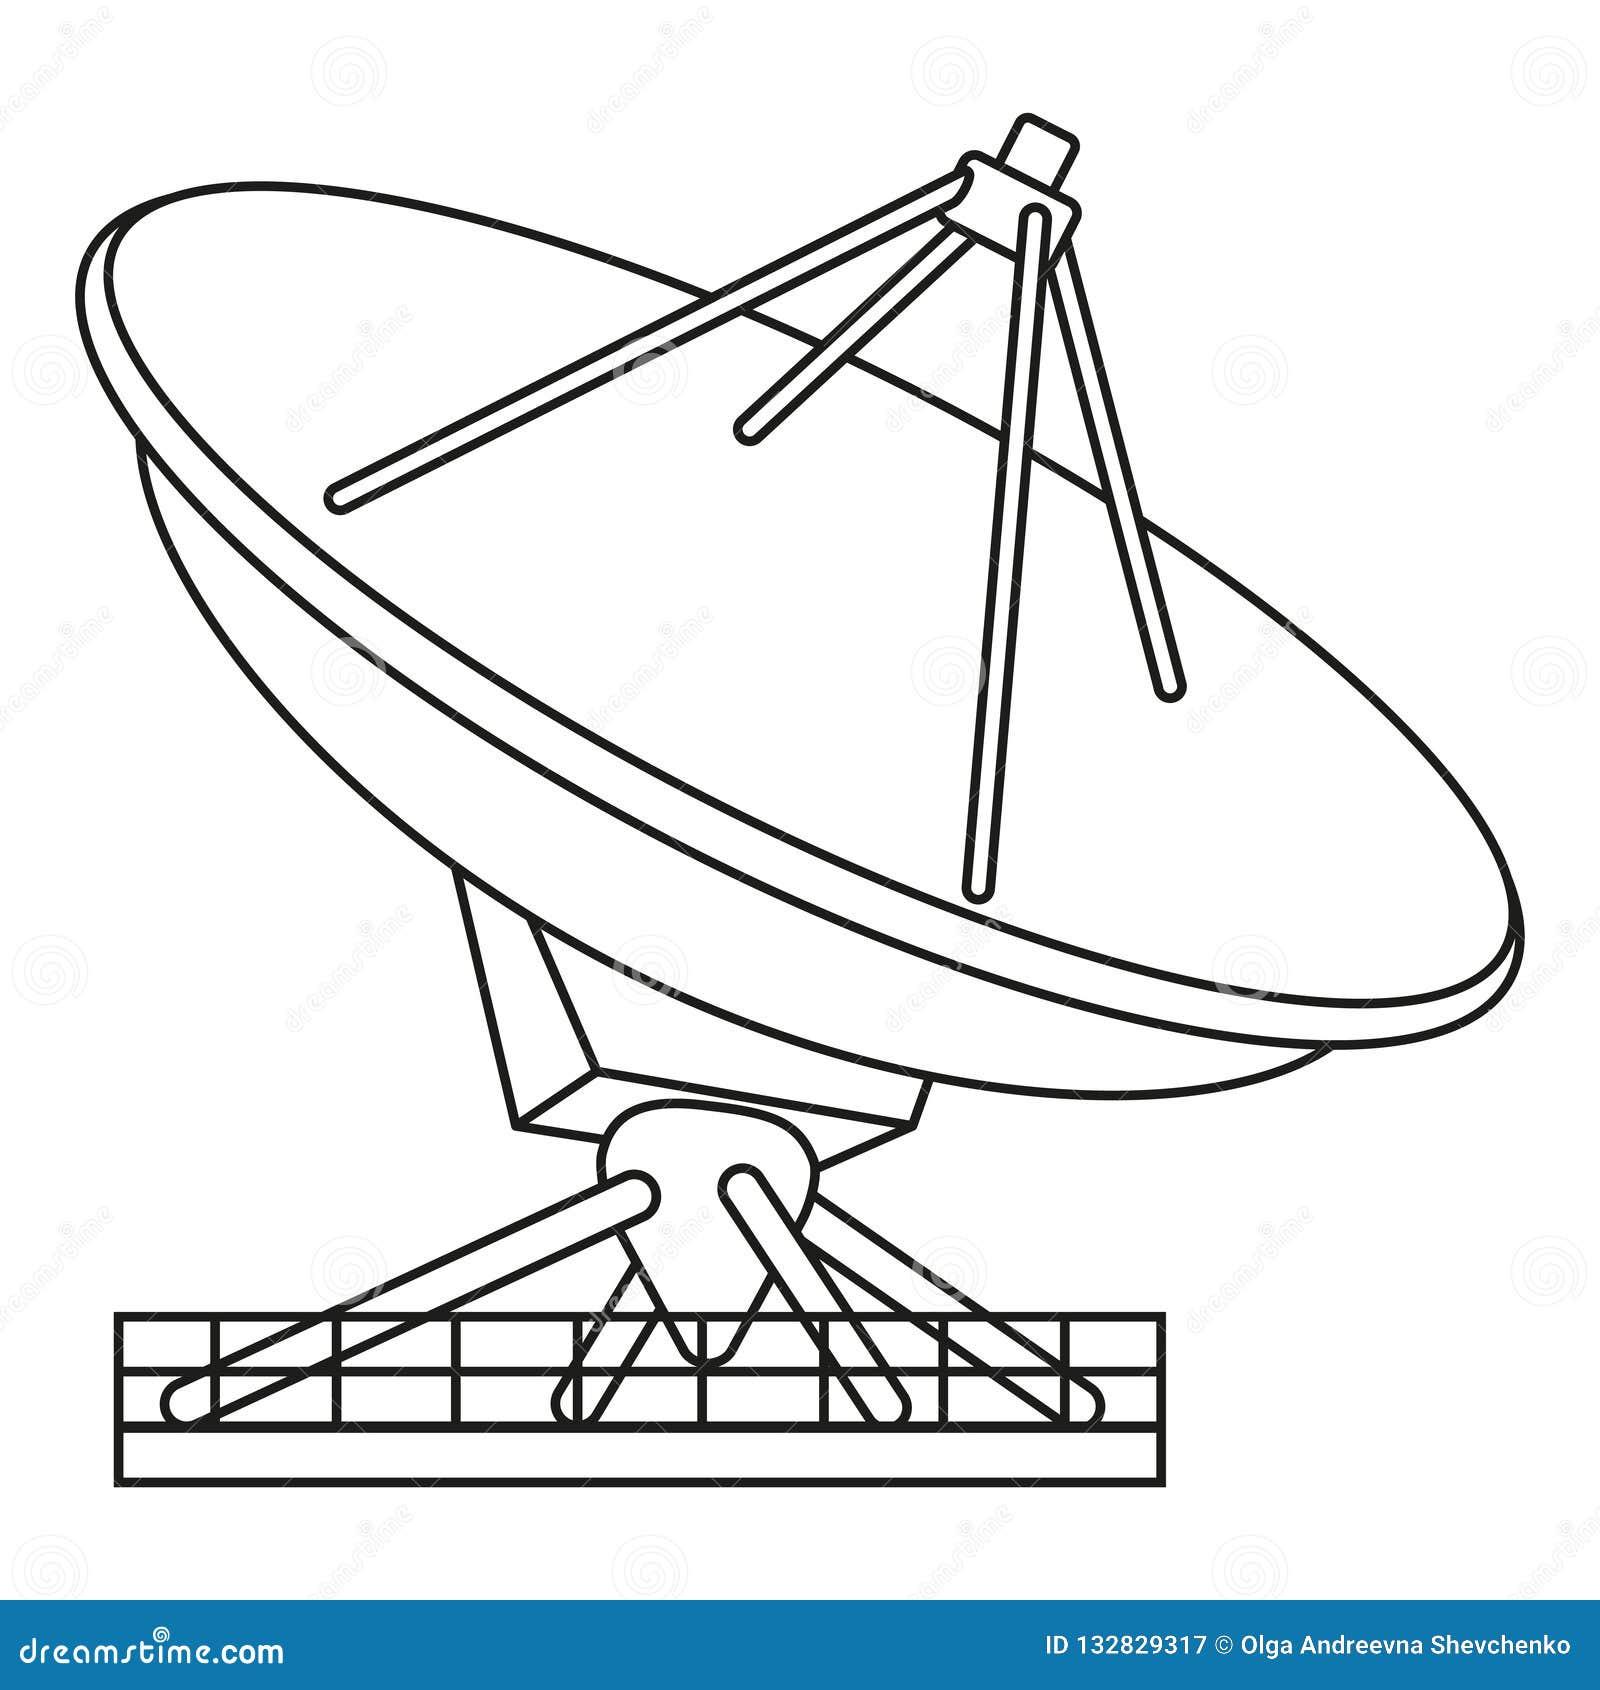 Line Art Black And White Radar Antena Stock Vector